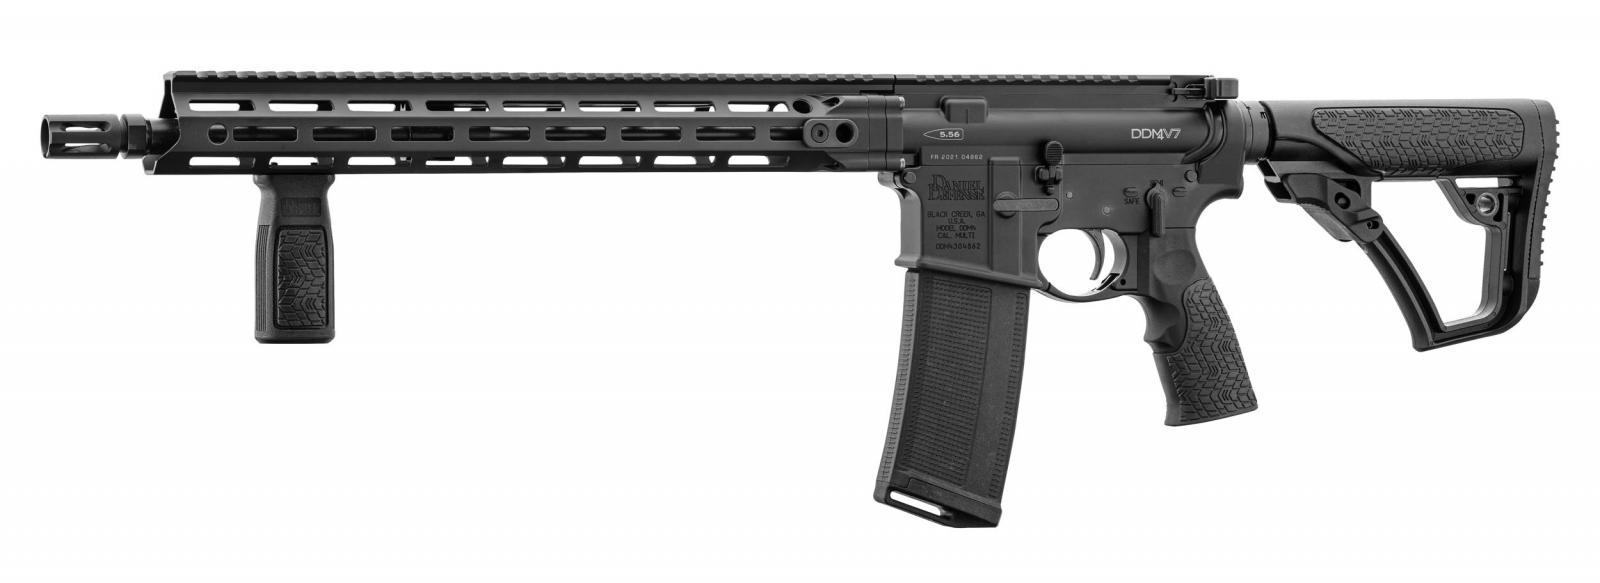 Carabine DANIEL DEFENSE DDM4 V7 type AR15 Cal. 223 (5.56x45)